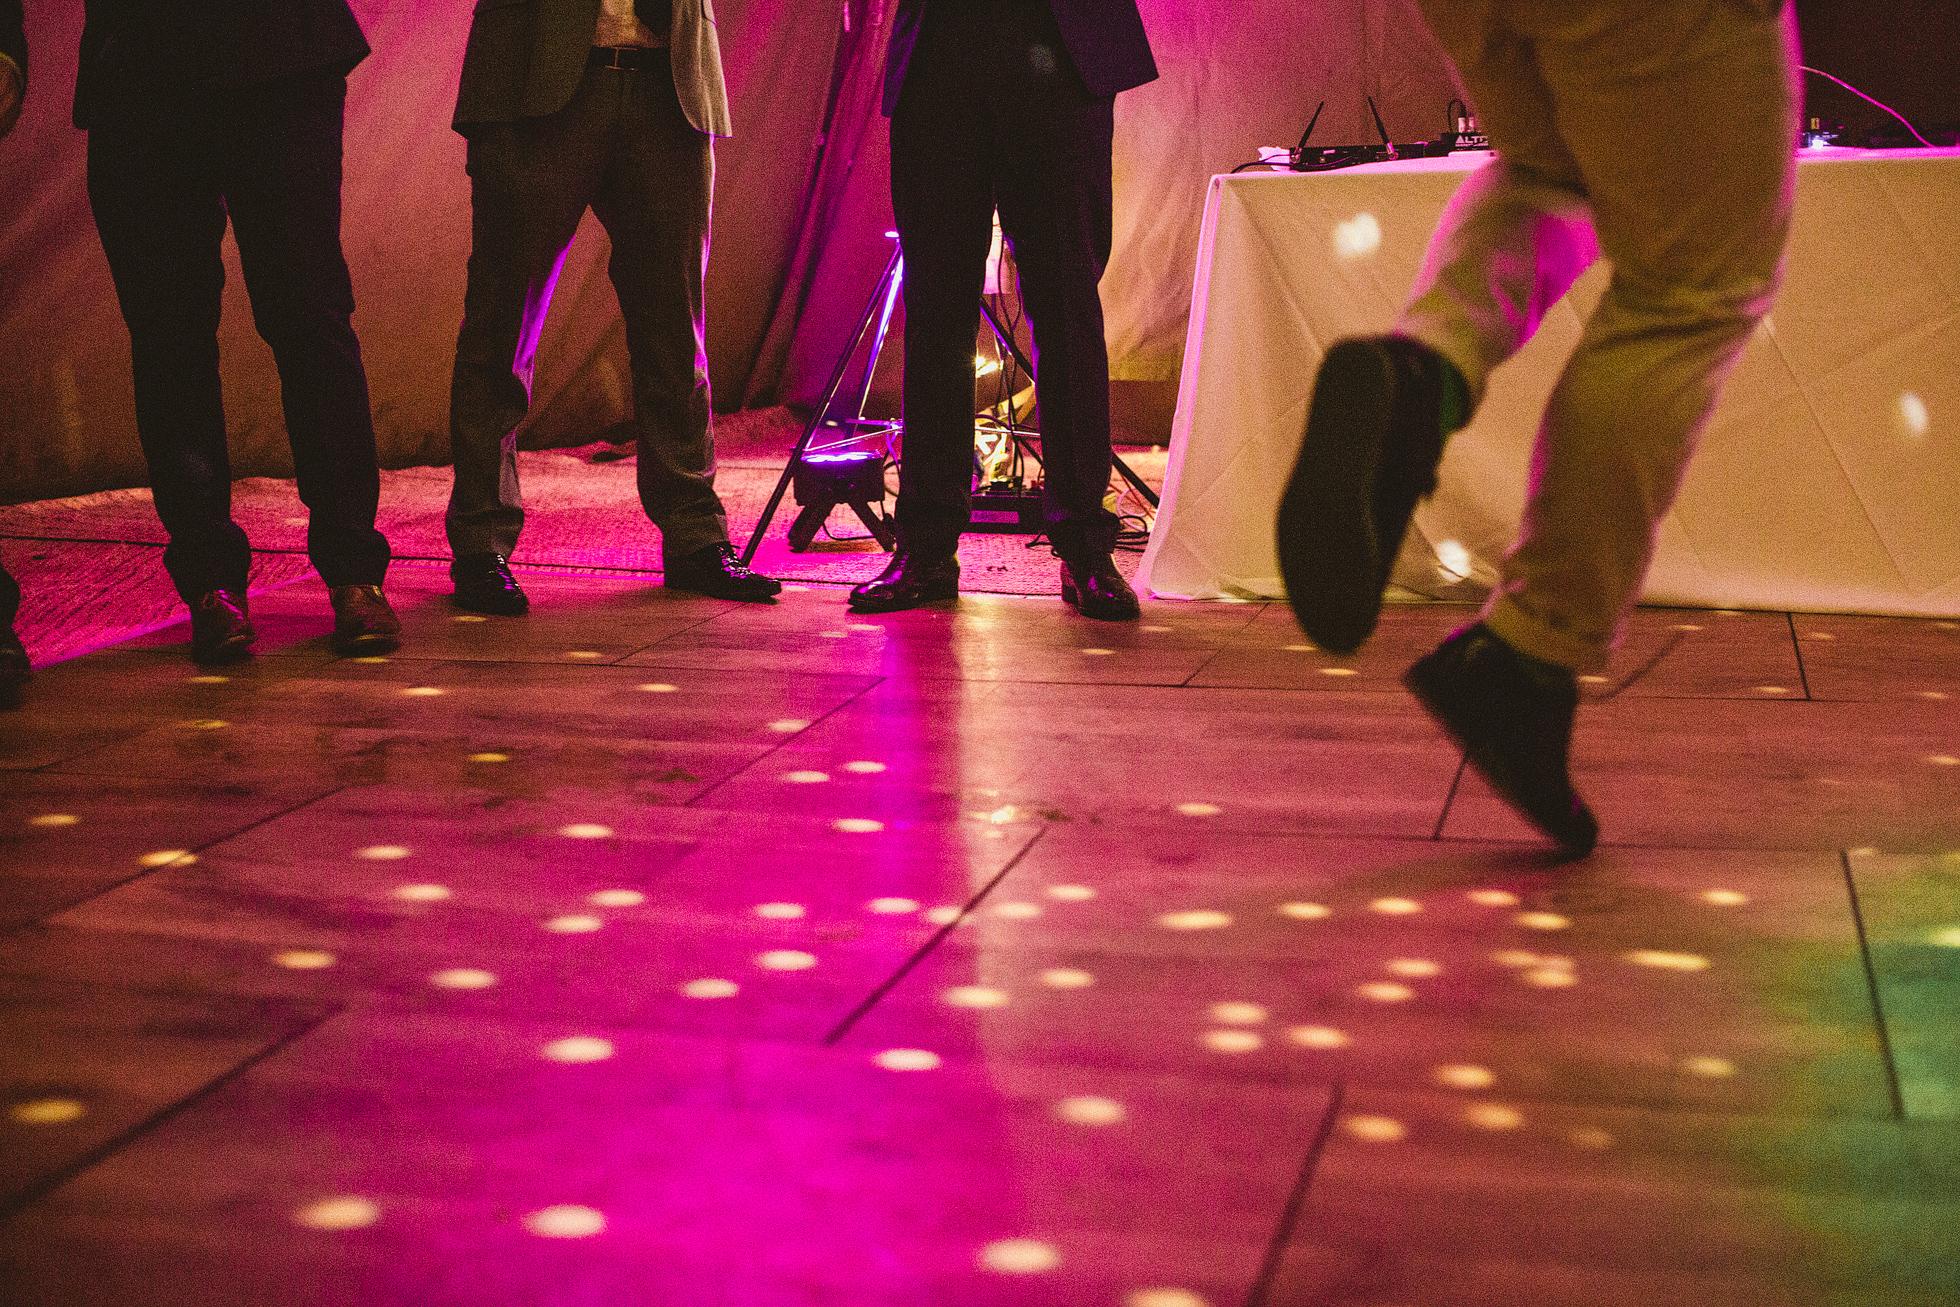 Broughton Hall Wedding dance floors